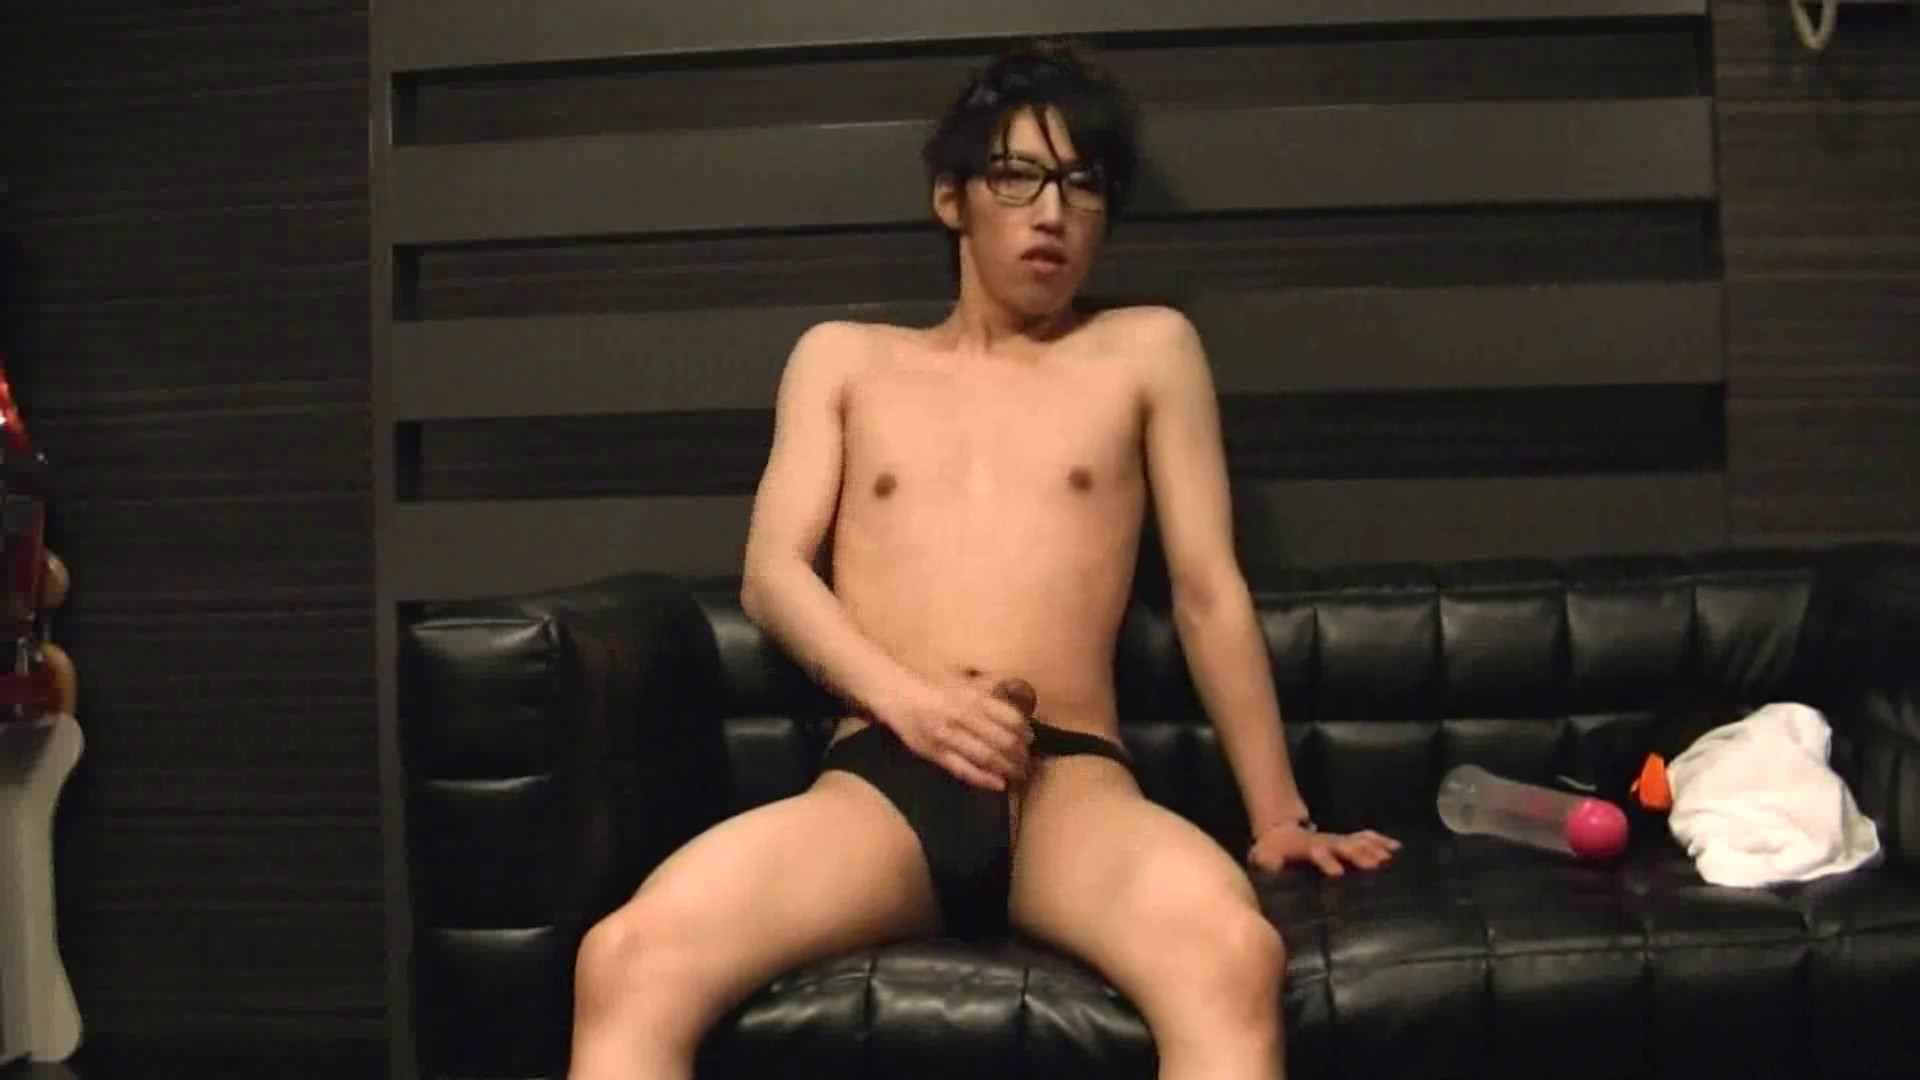 ONA見せカーニバル!! Vol3 男  93pic 39